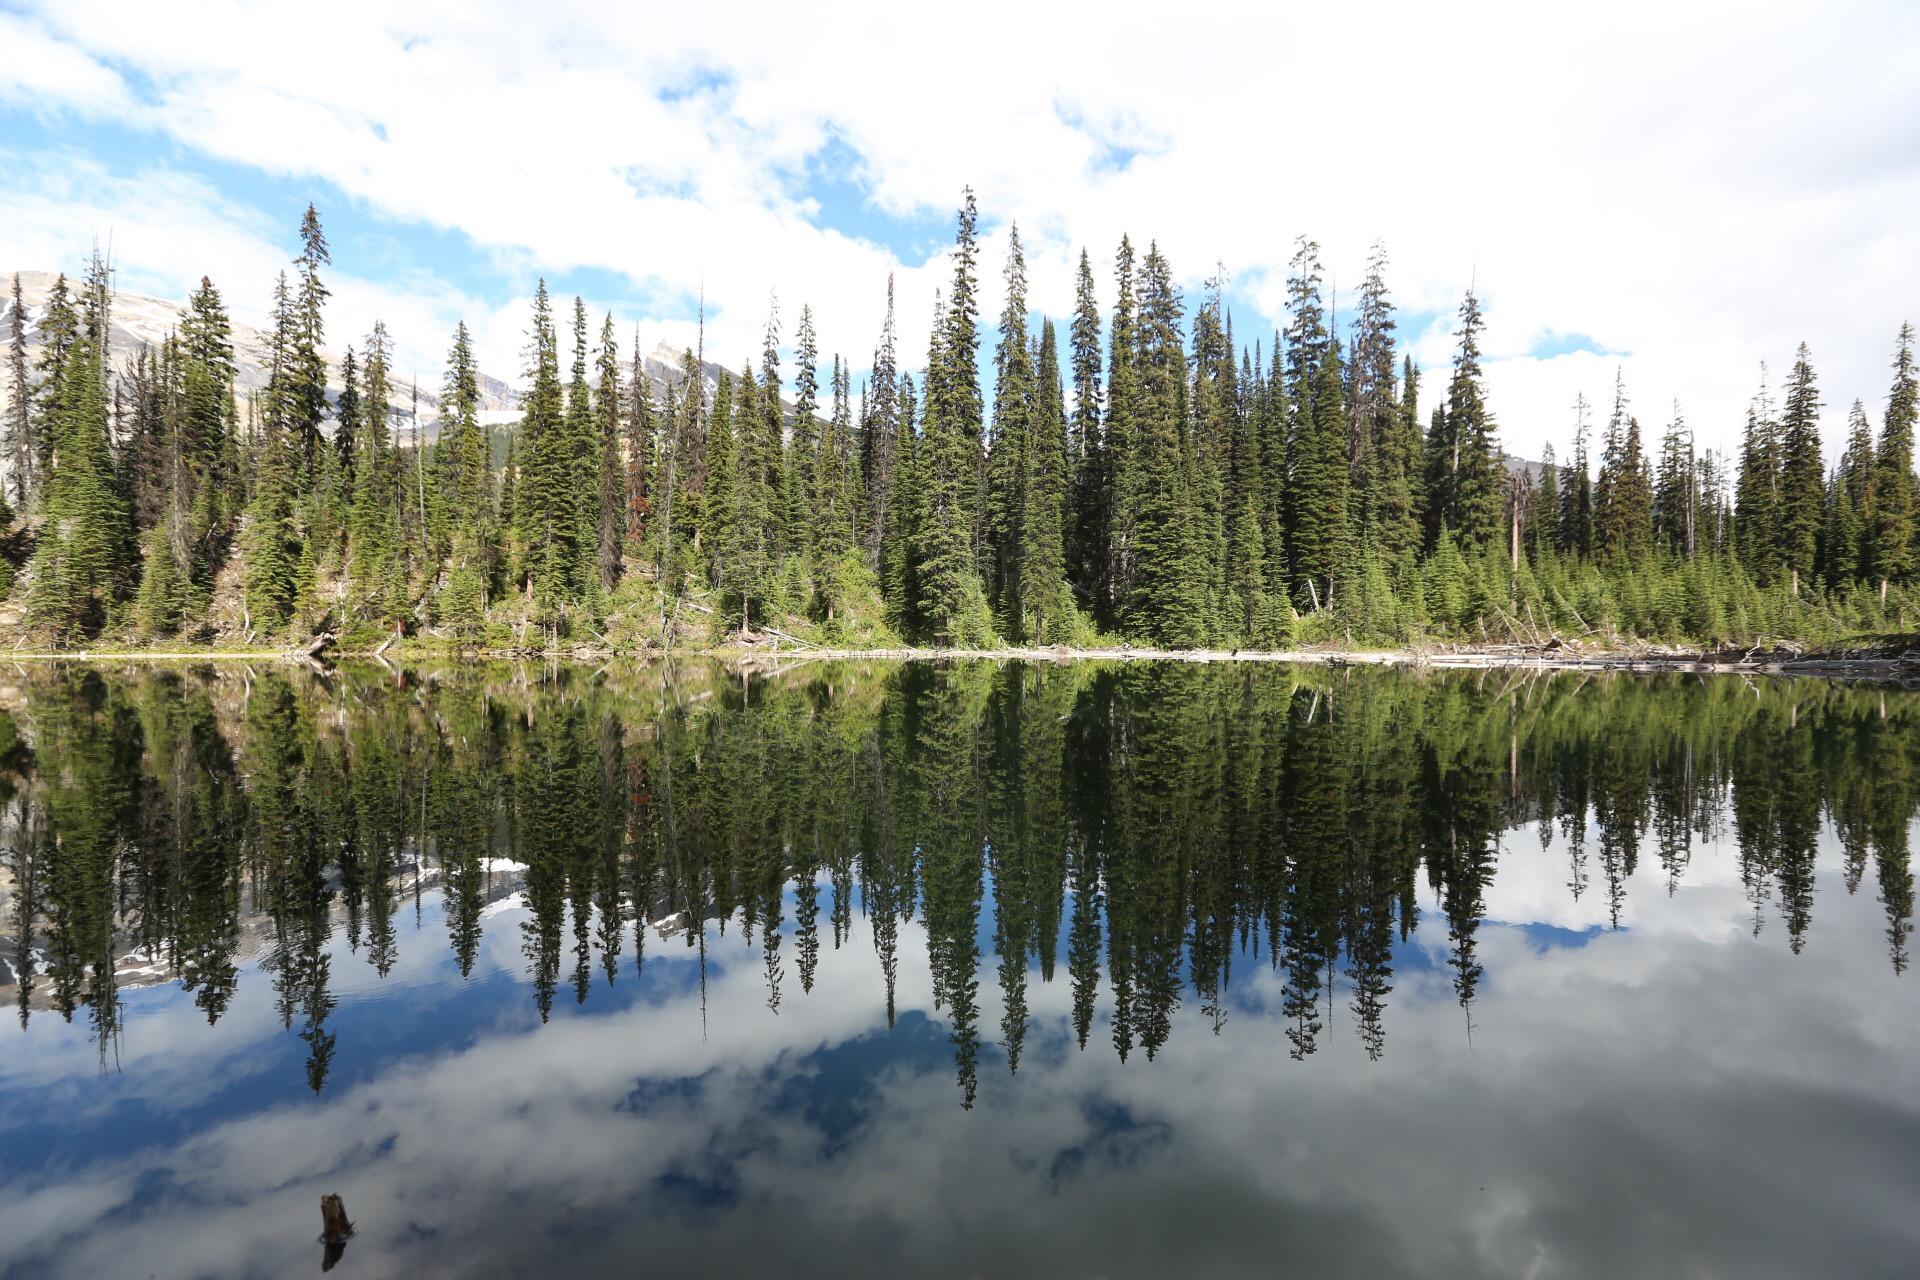 15 Photos to Inspire You to Visit Banff National Park and Yoho National Park